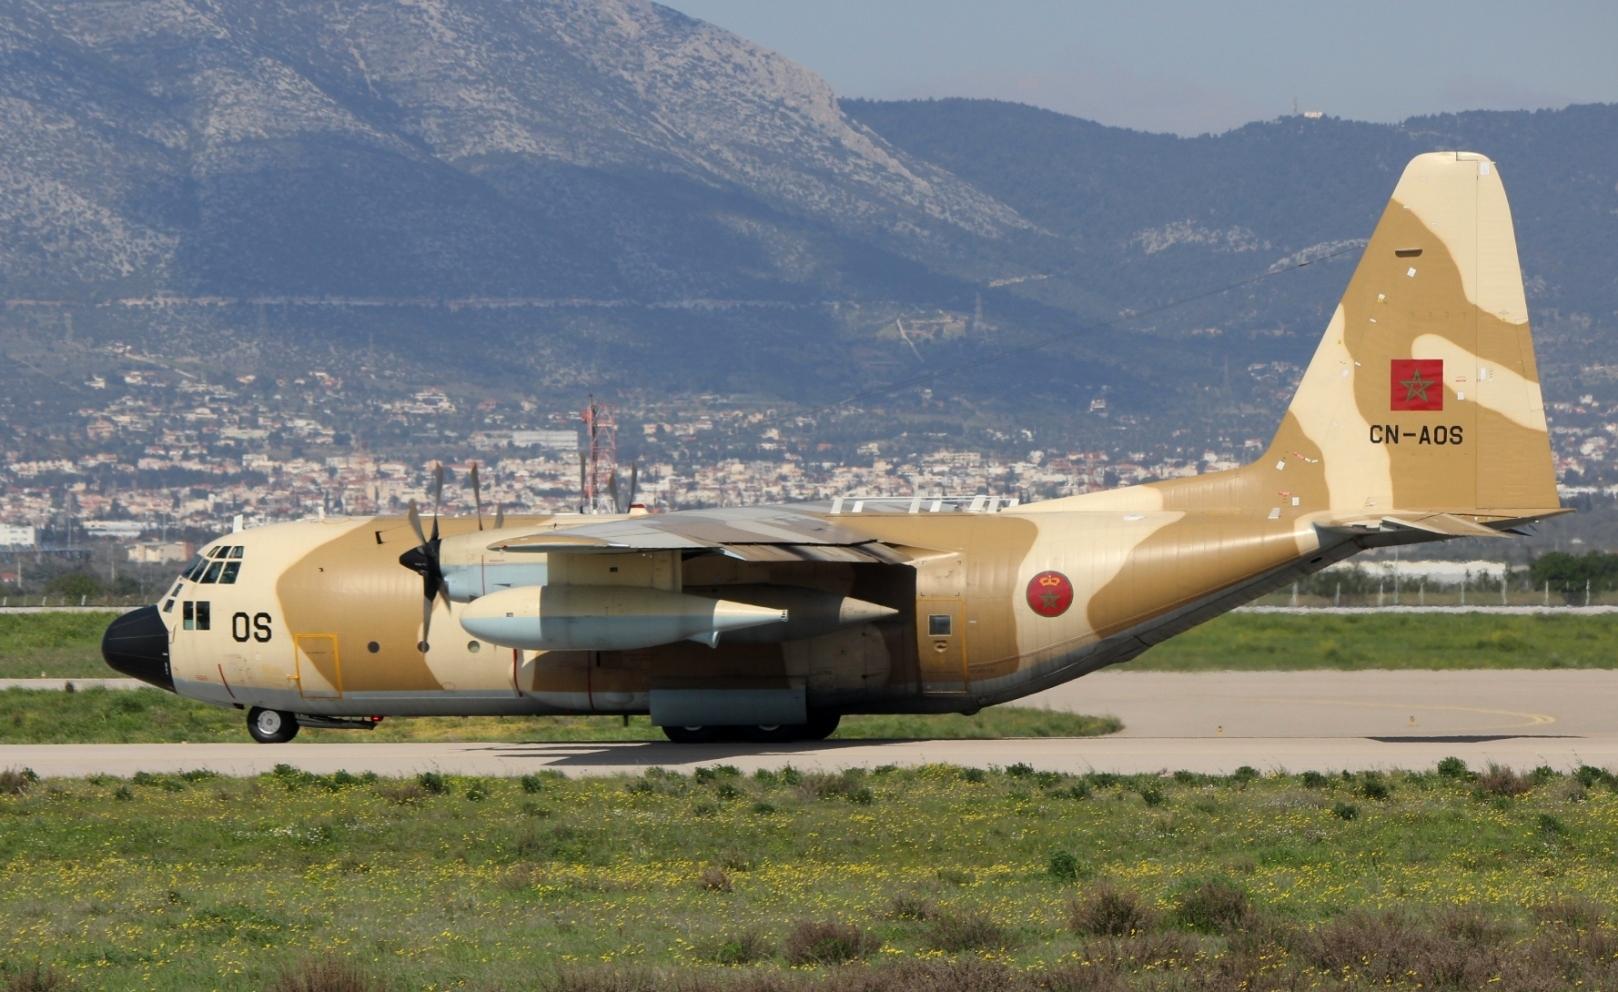 FRA: Photos d'avions de transport - Page 31 32864241414_aa4da193aa_o